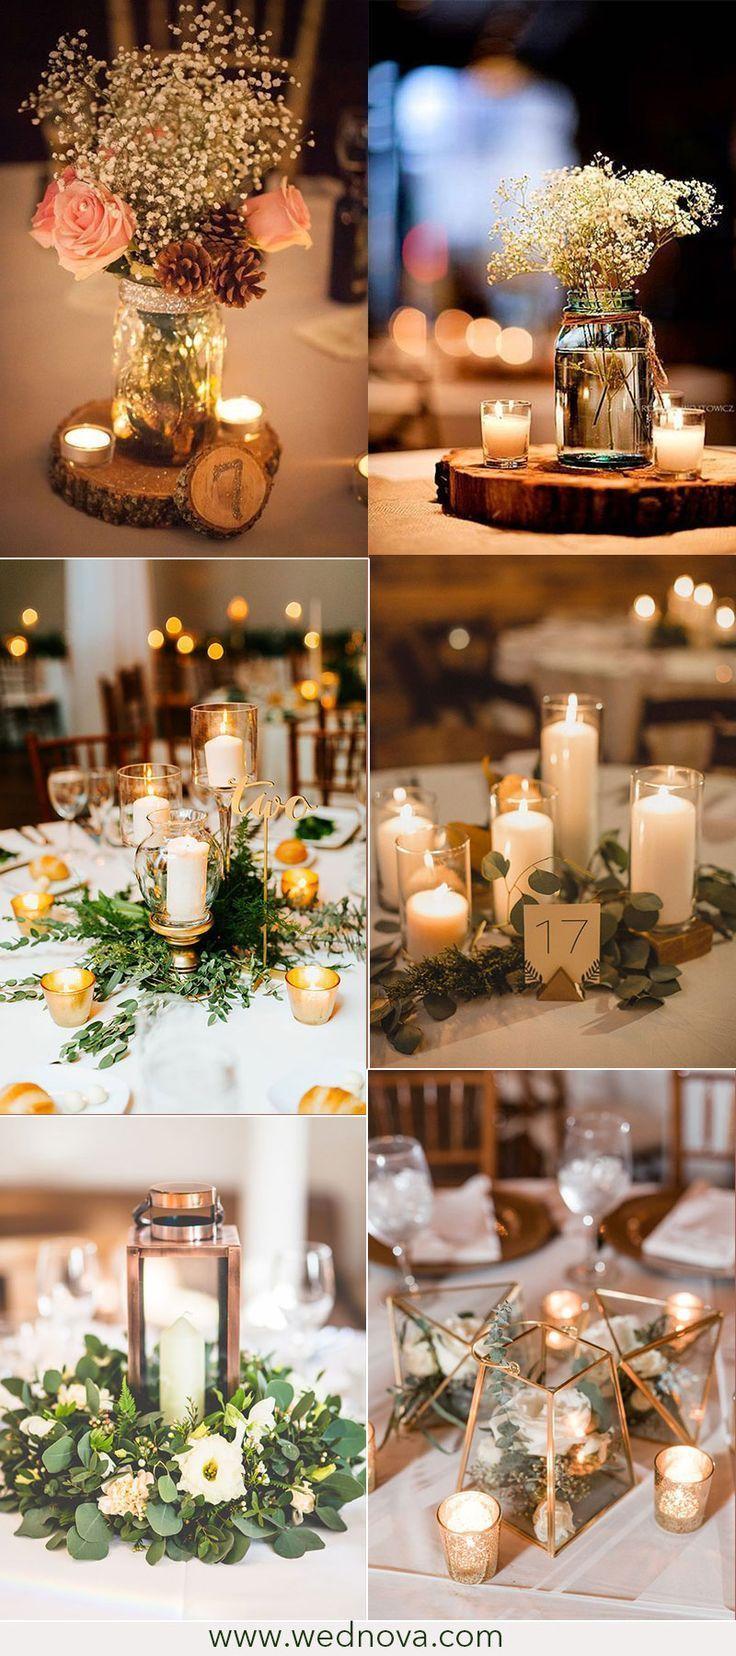 32 Greenery Wedding Decor Ideas: Budget and Eco Friendly Wedding